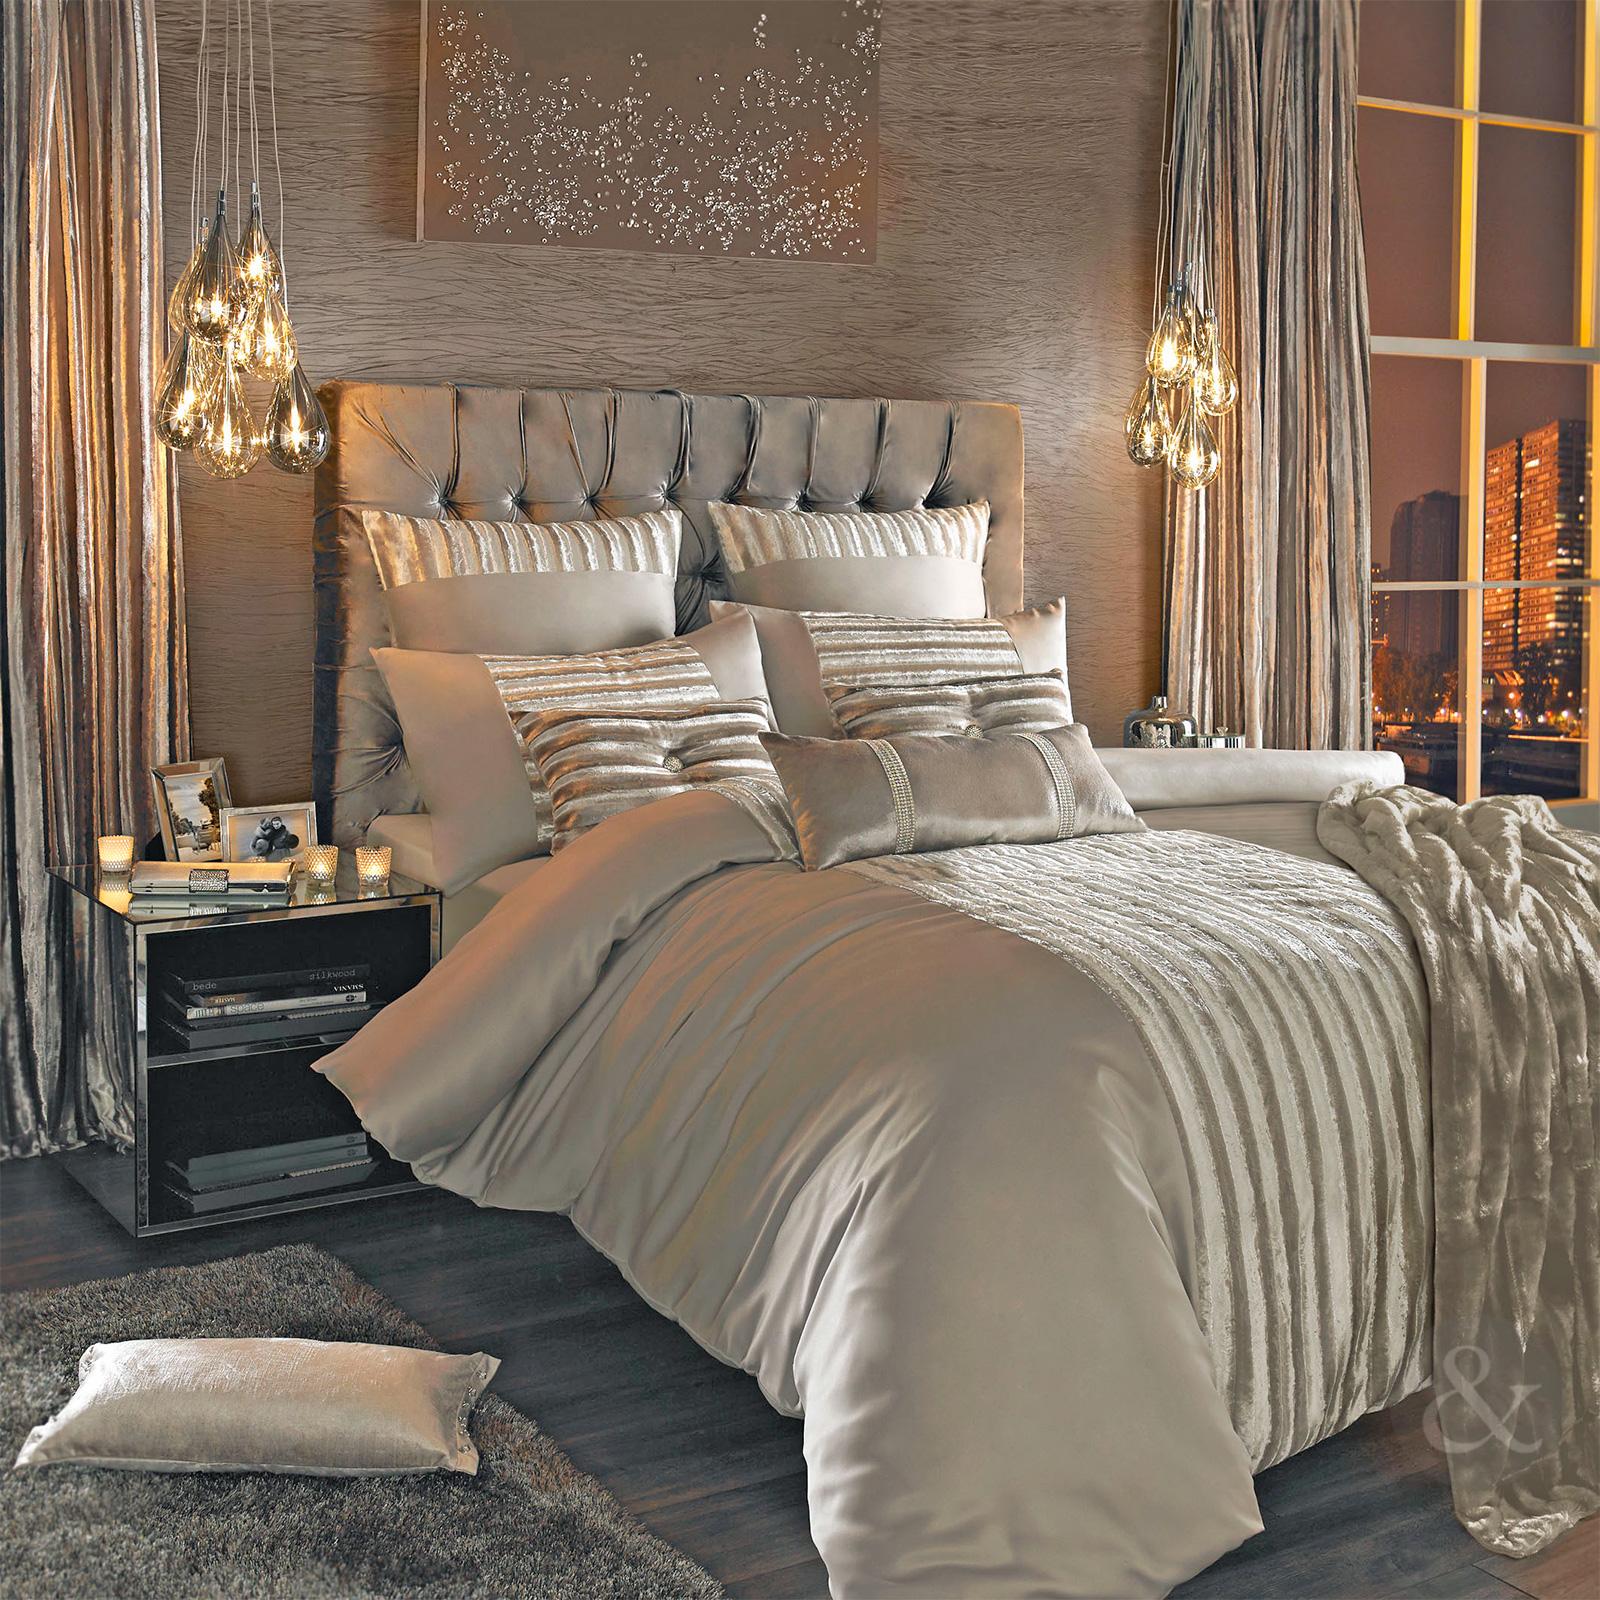 housse de couette luxe cgmrotterdam. Black Bedroom Furniture Sets. Home Design Ideas